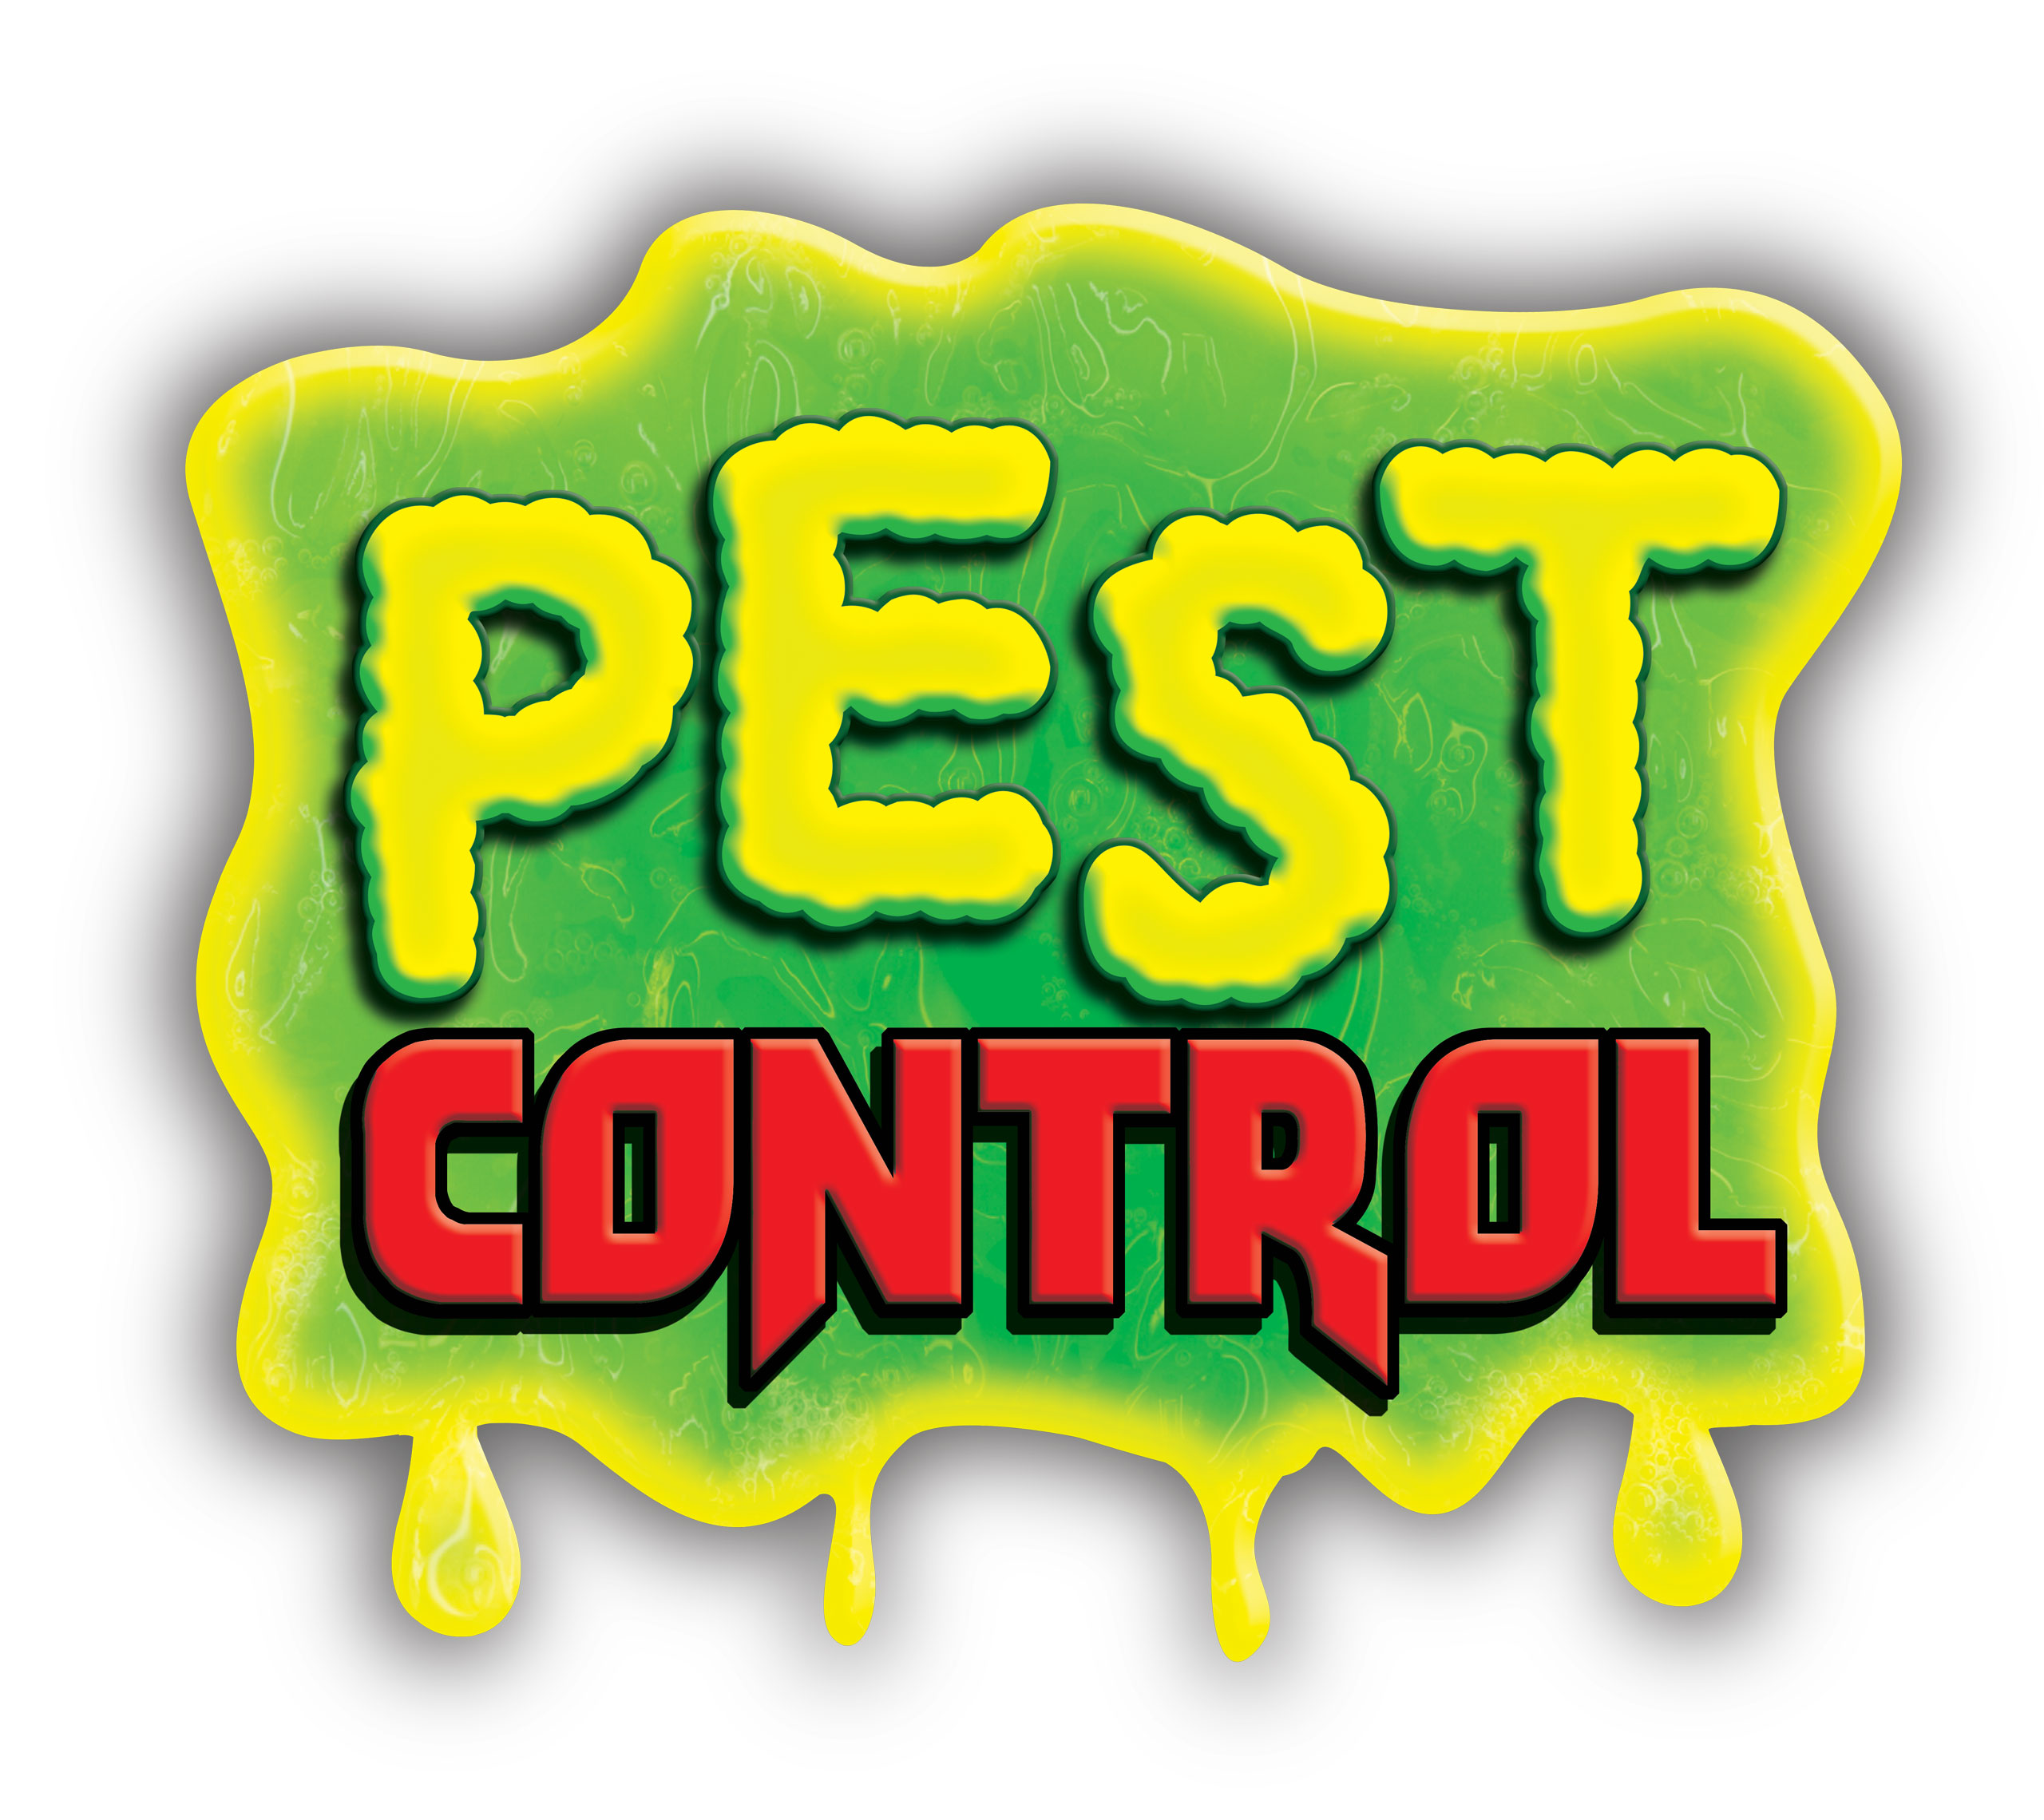 Our Brands - Pest Control